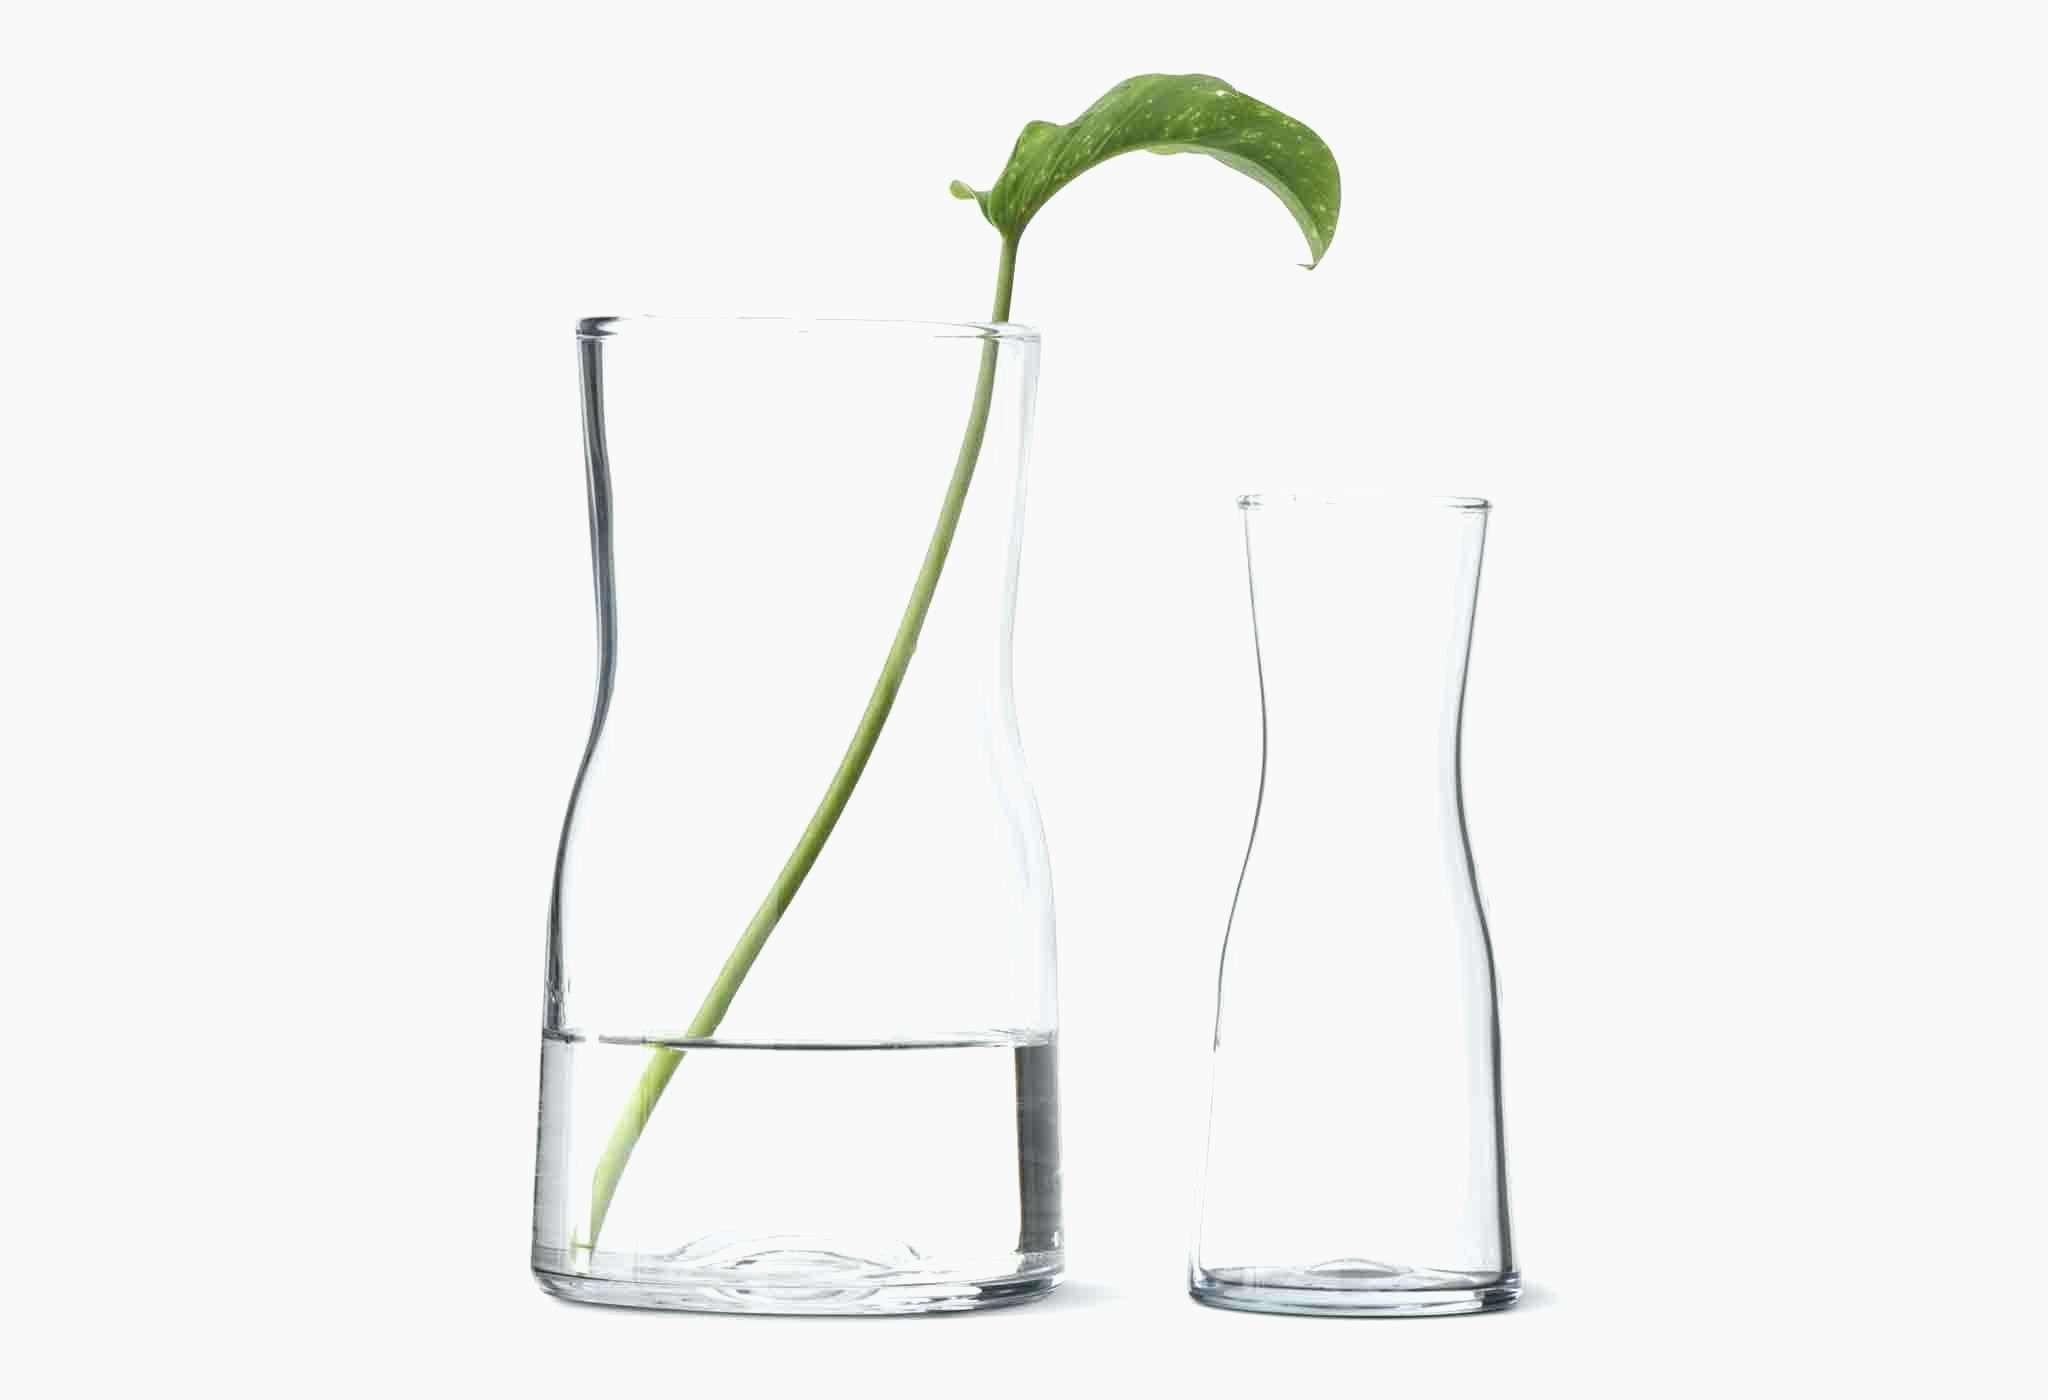 27 Popular Ikea Vases Set Of 3 2021 free download ikea vases set of 3 of inspirierend ikea hydroponics ikea regarding vase stand wood elegant new design ikea mantel great pe s5h vases ikea vase i 0d